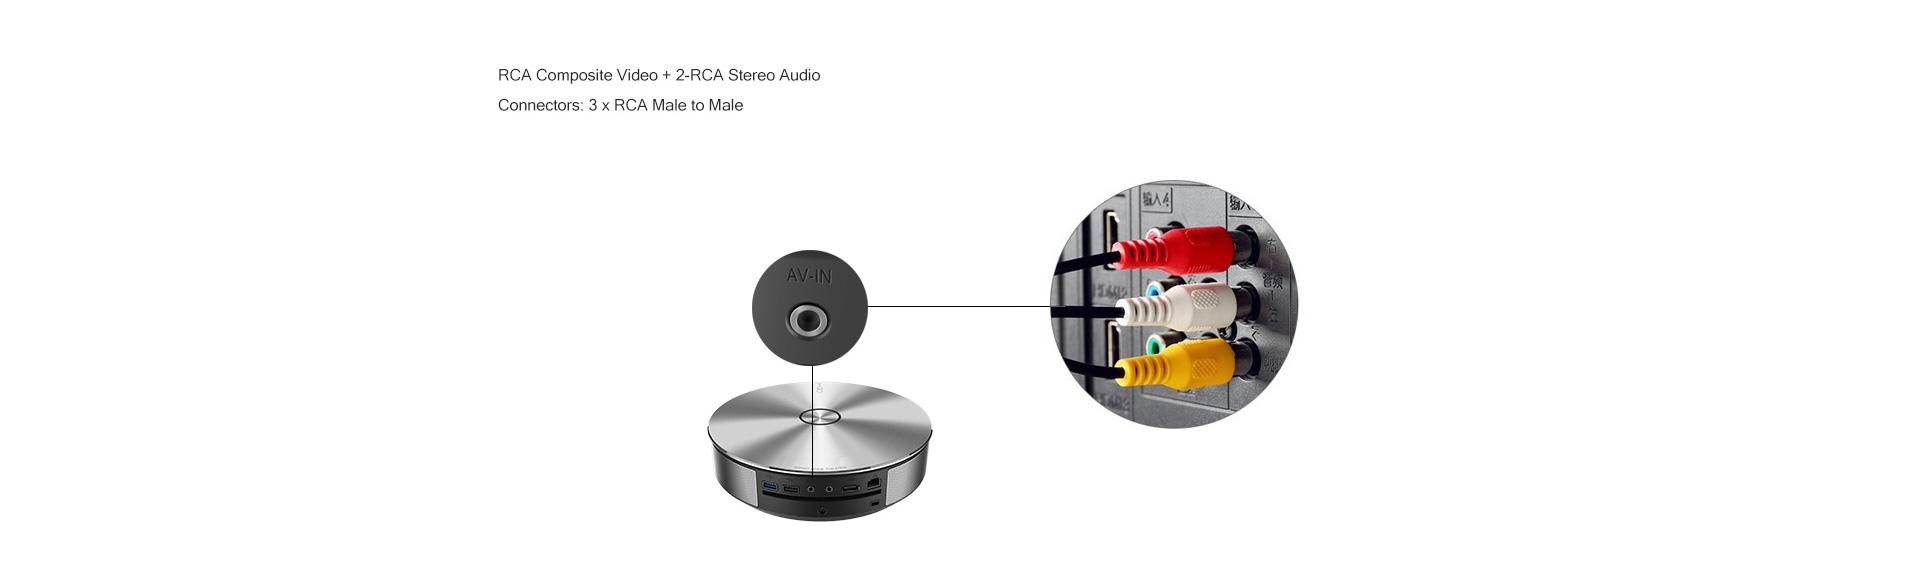 RCA Comp